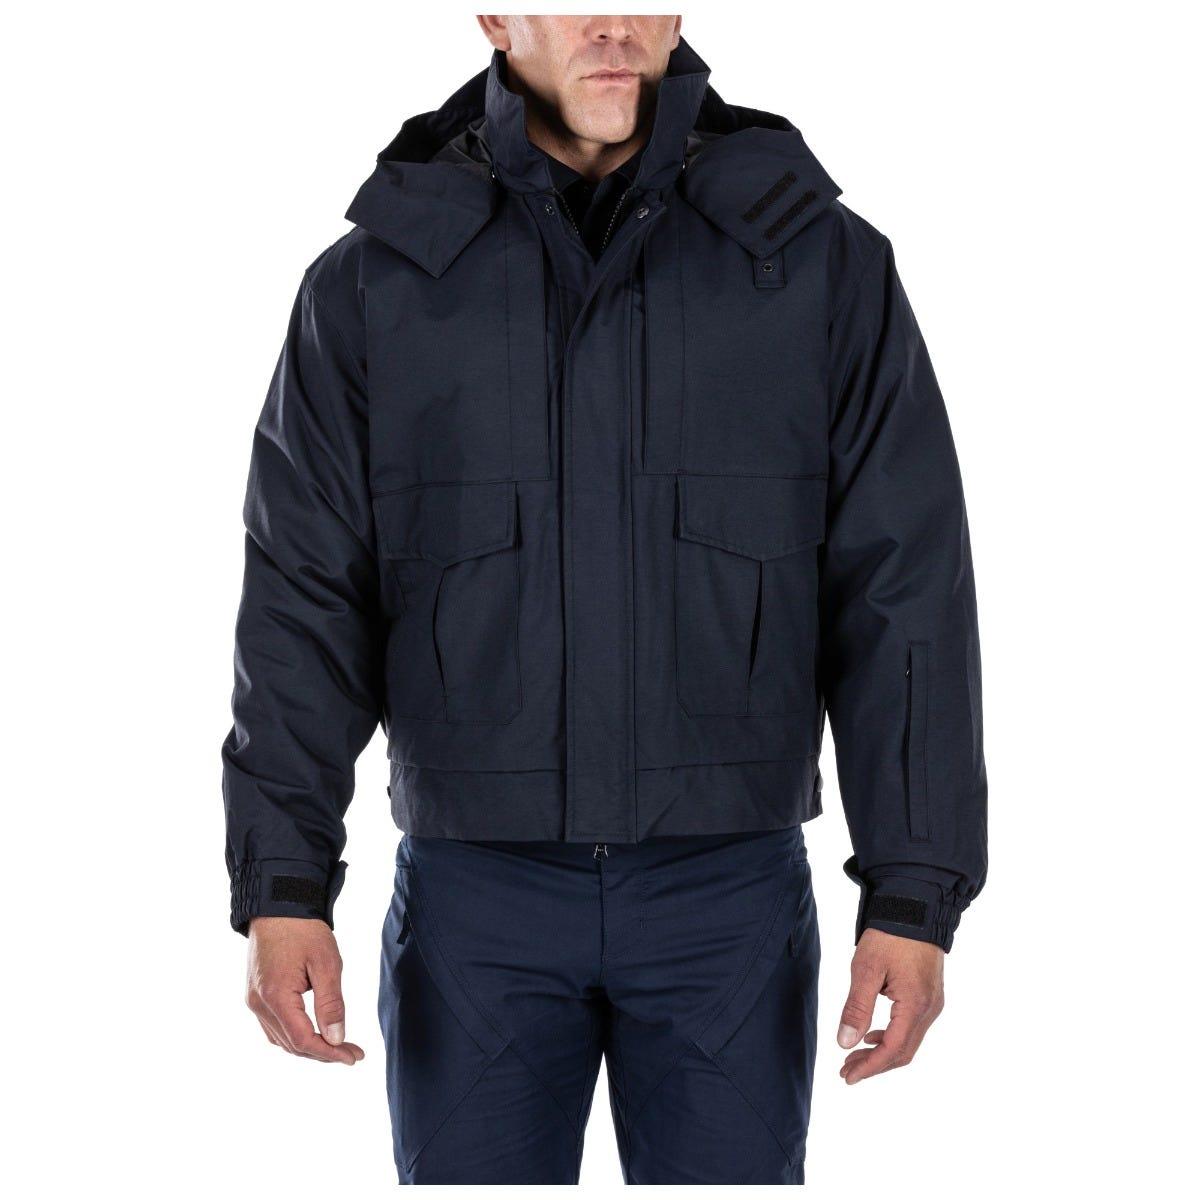 5.11 Tactical Men's 4-in-1 Patrol Jacket™ (Blue) thumbnail